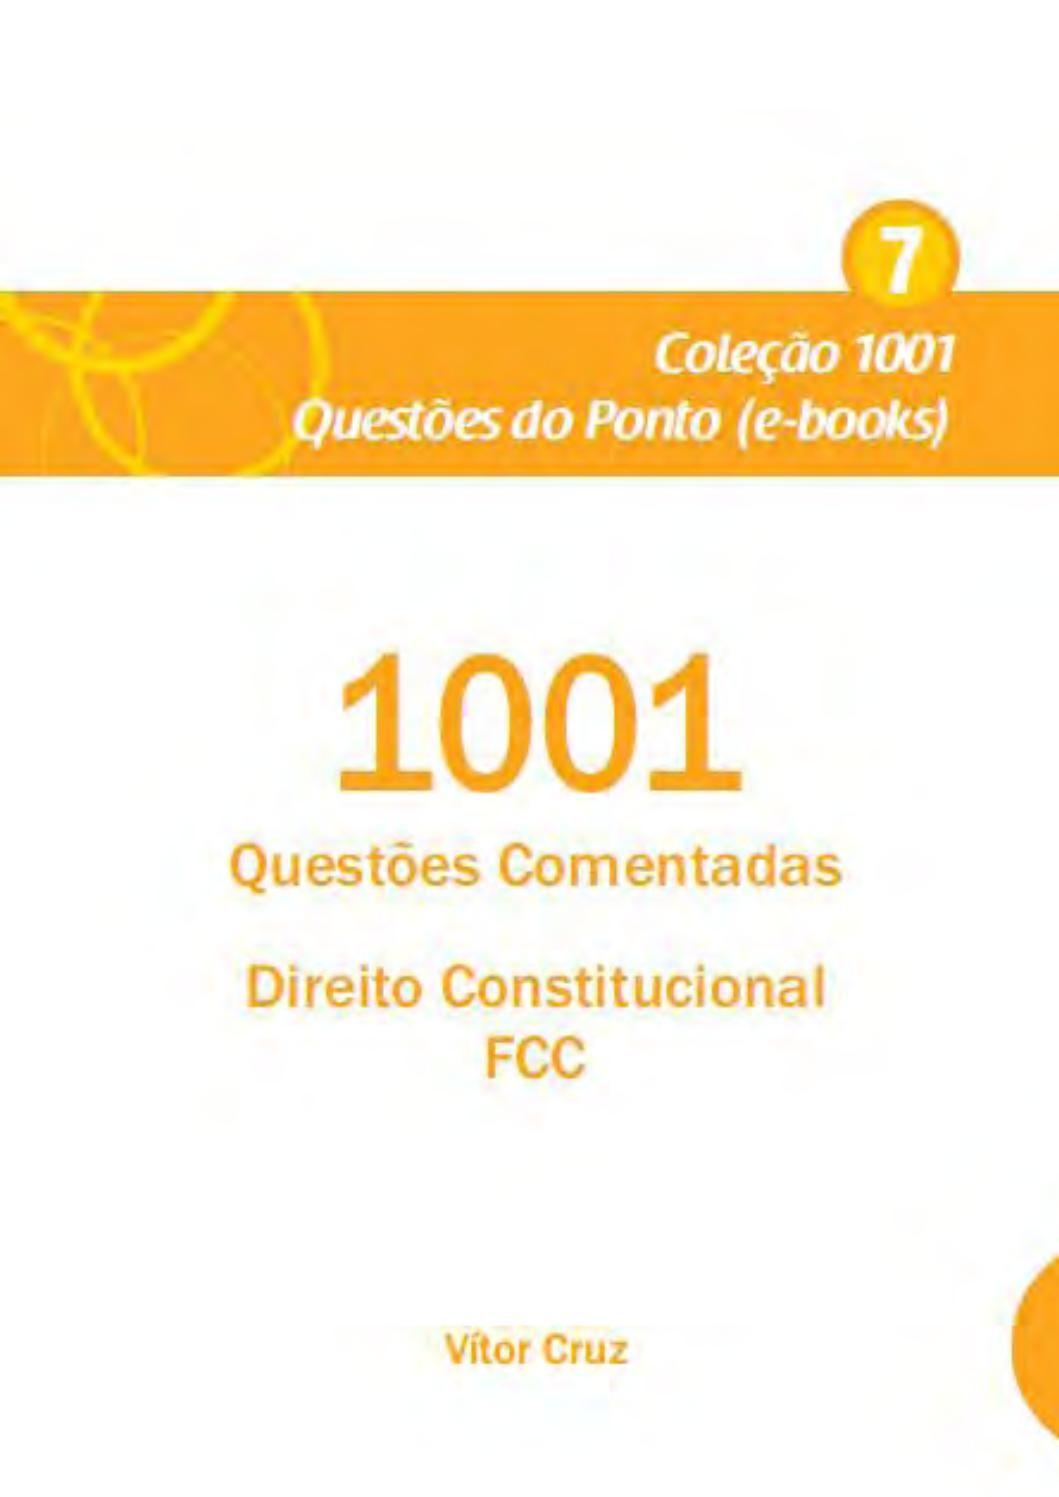 1001 Questoes Comentadas Direito Constitucional Fcc Questoes De